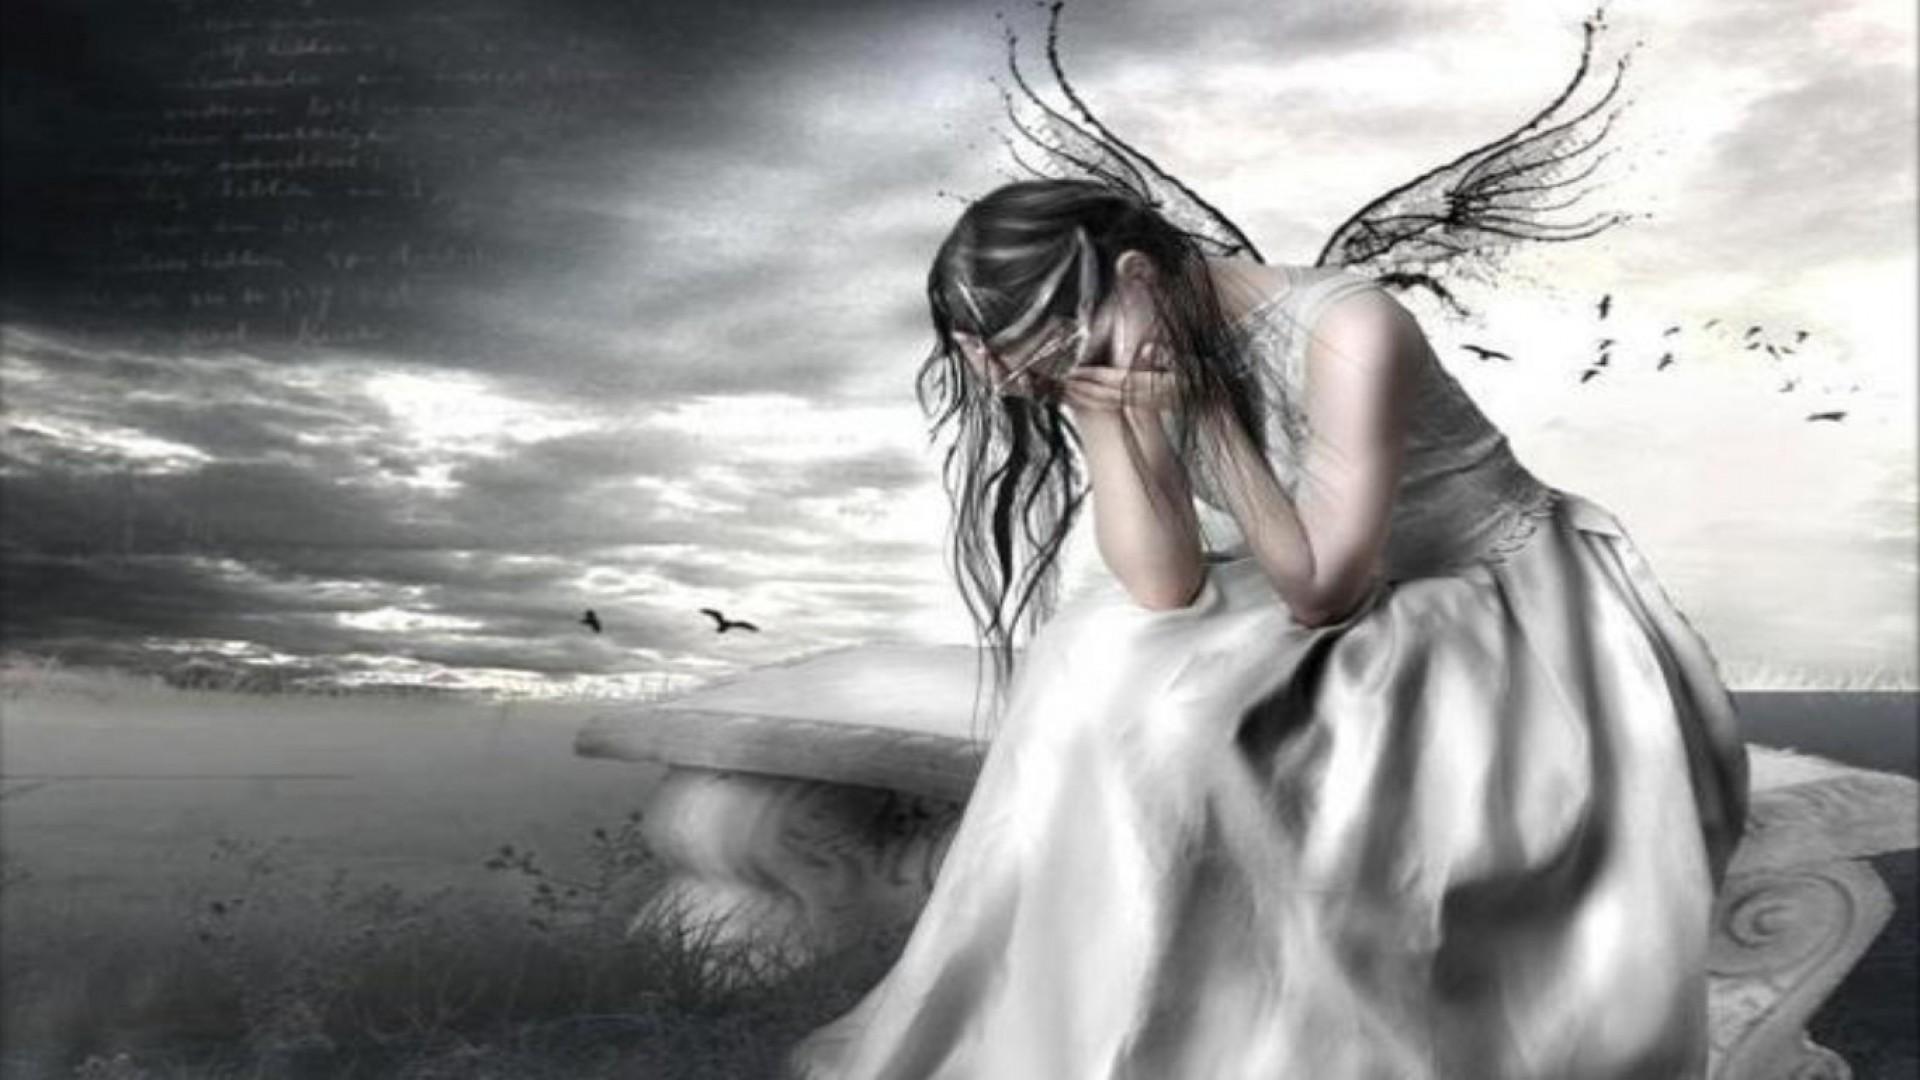 Crying Fairy Wallpaper – MixHD wallpapers